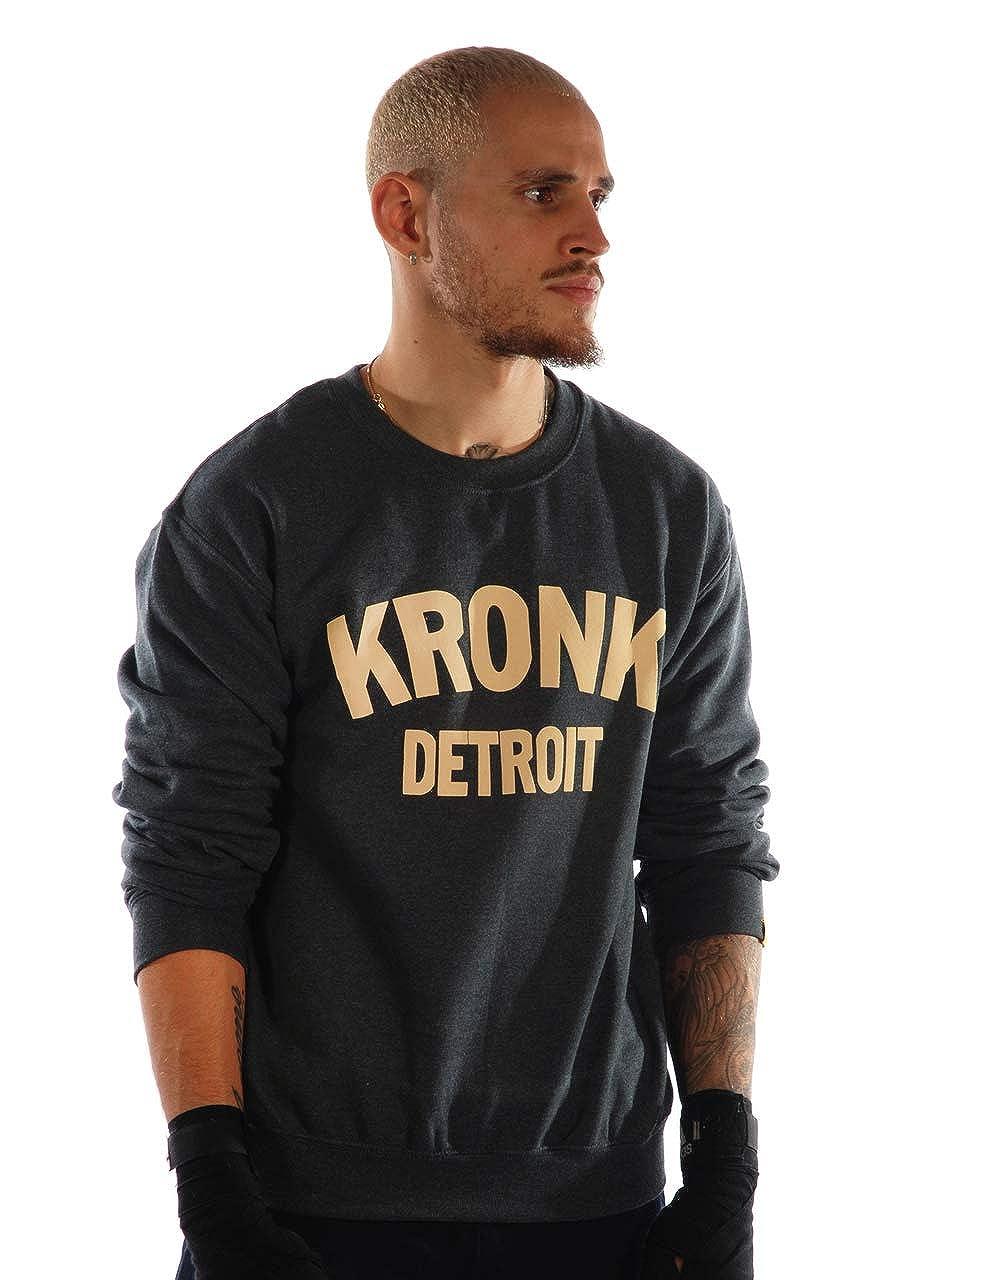 KRONK Boxe Detroit pour Homme Sweat Klitschko Abigail